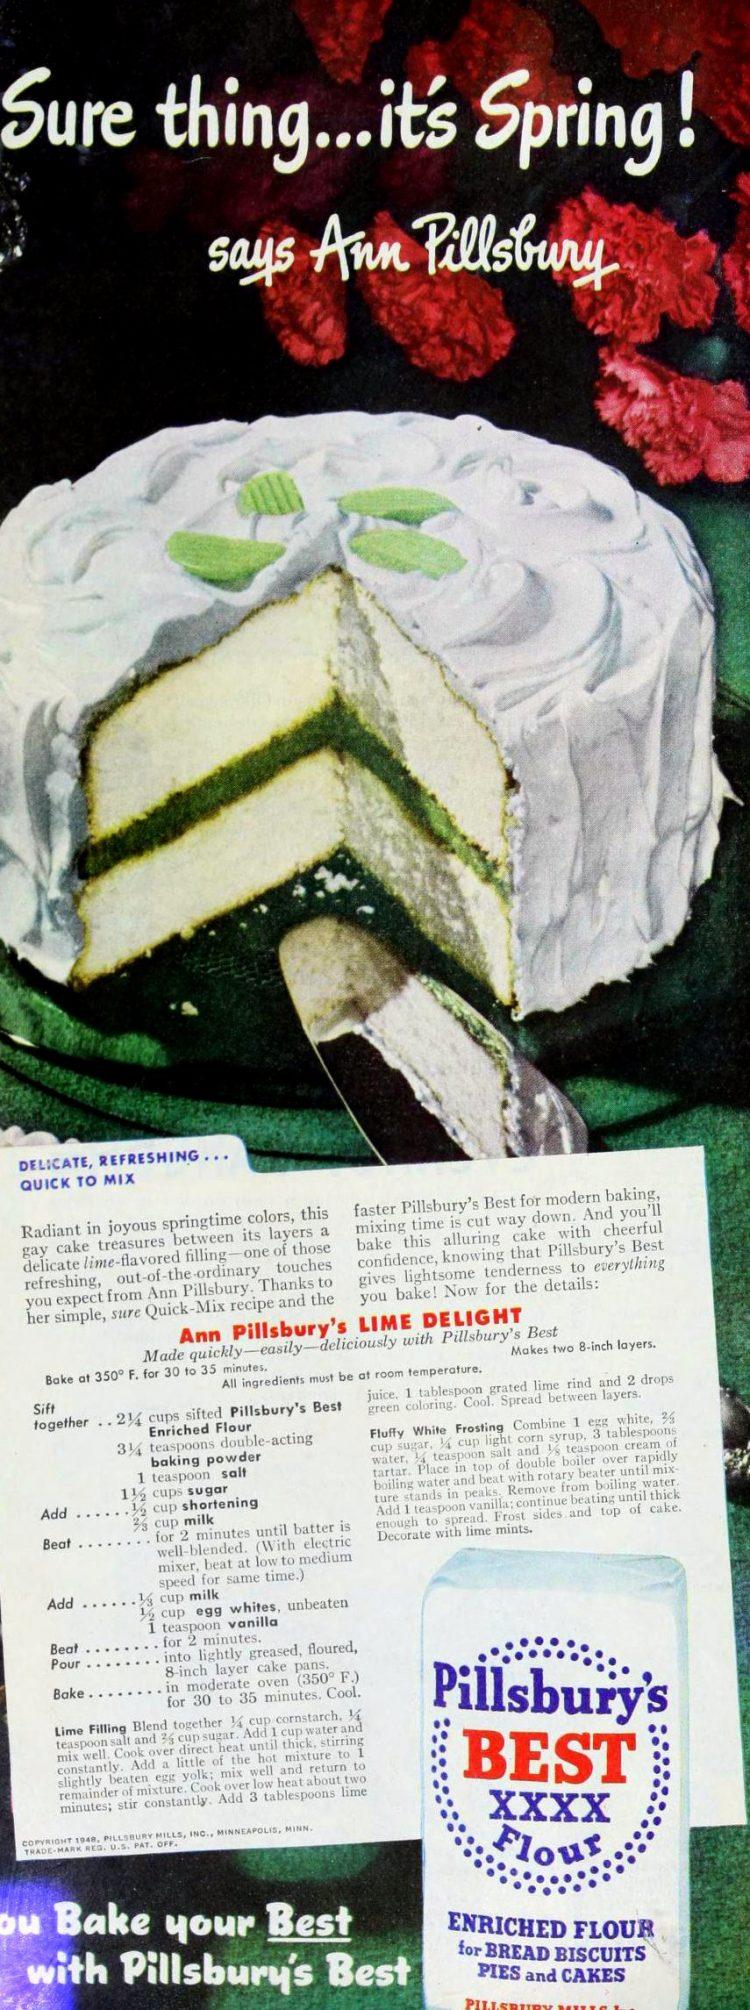 Lime delight cake recipe (1948)